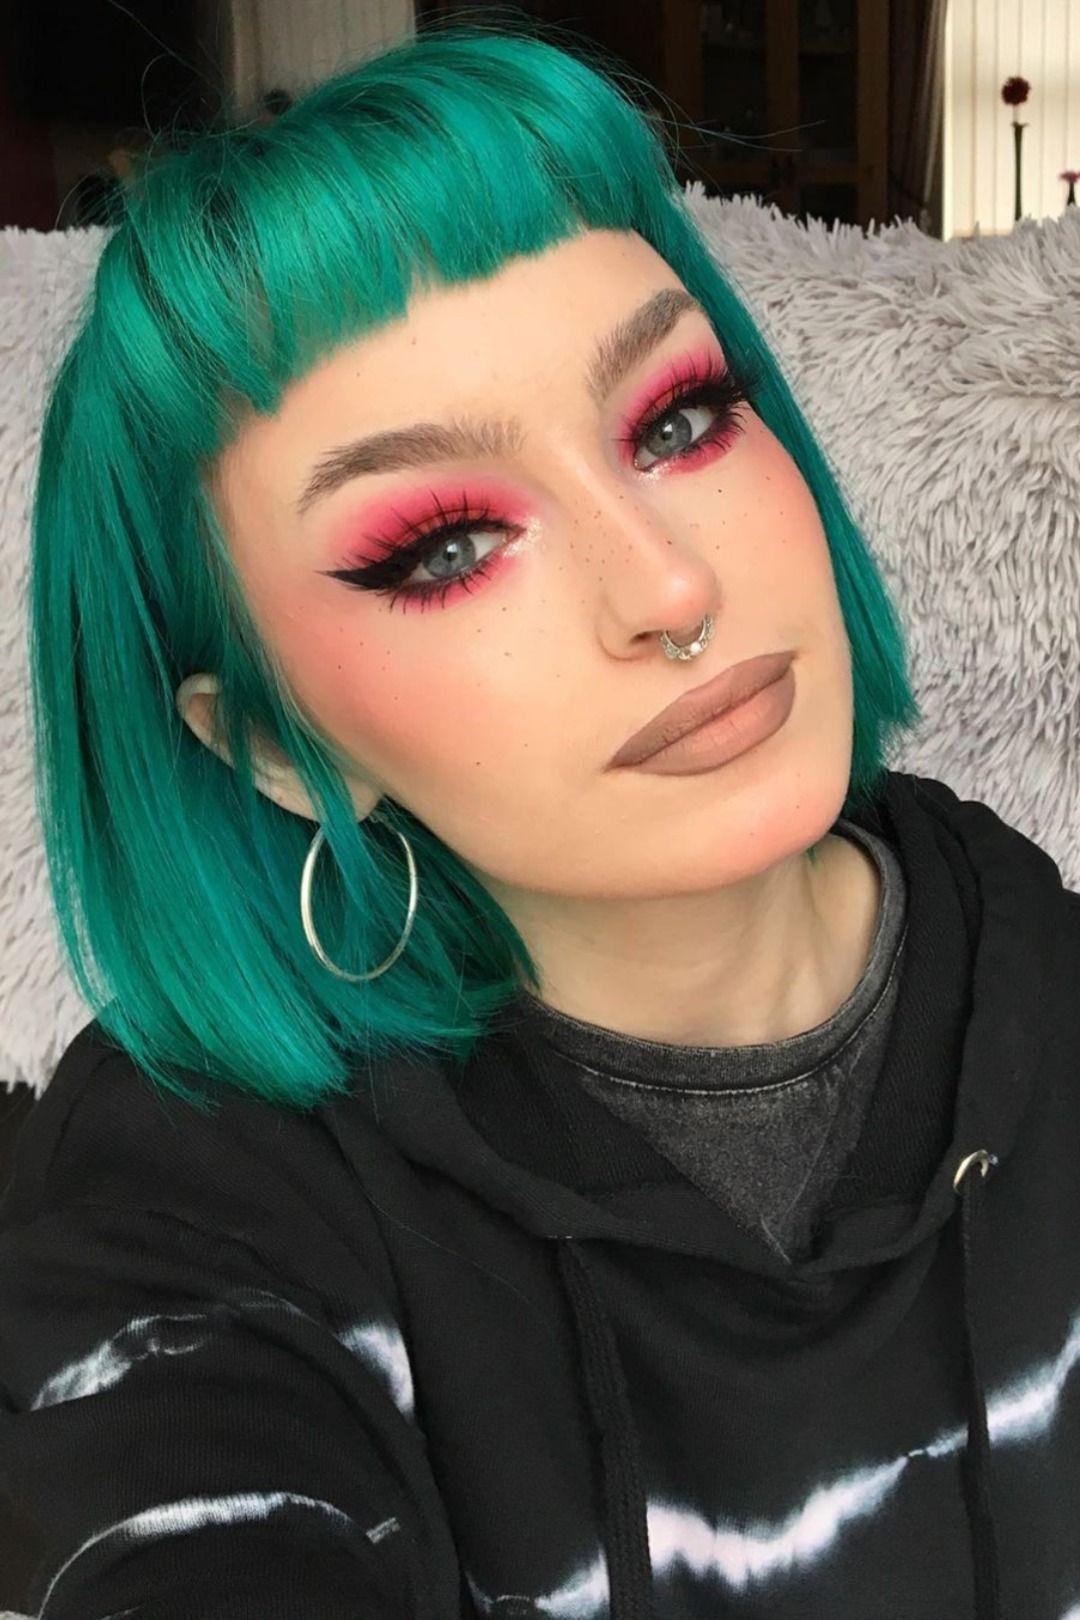 Charliewakeman In 2020 Turquoise Hair Short Teal Hair Green Hair